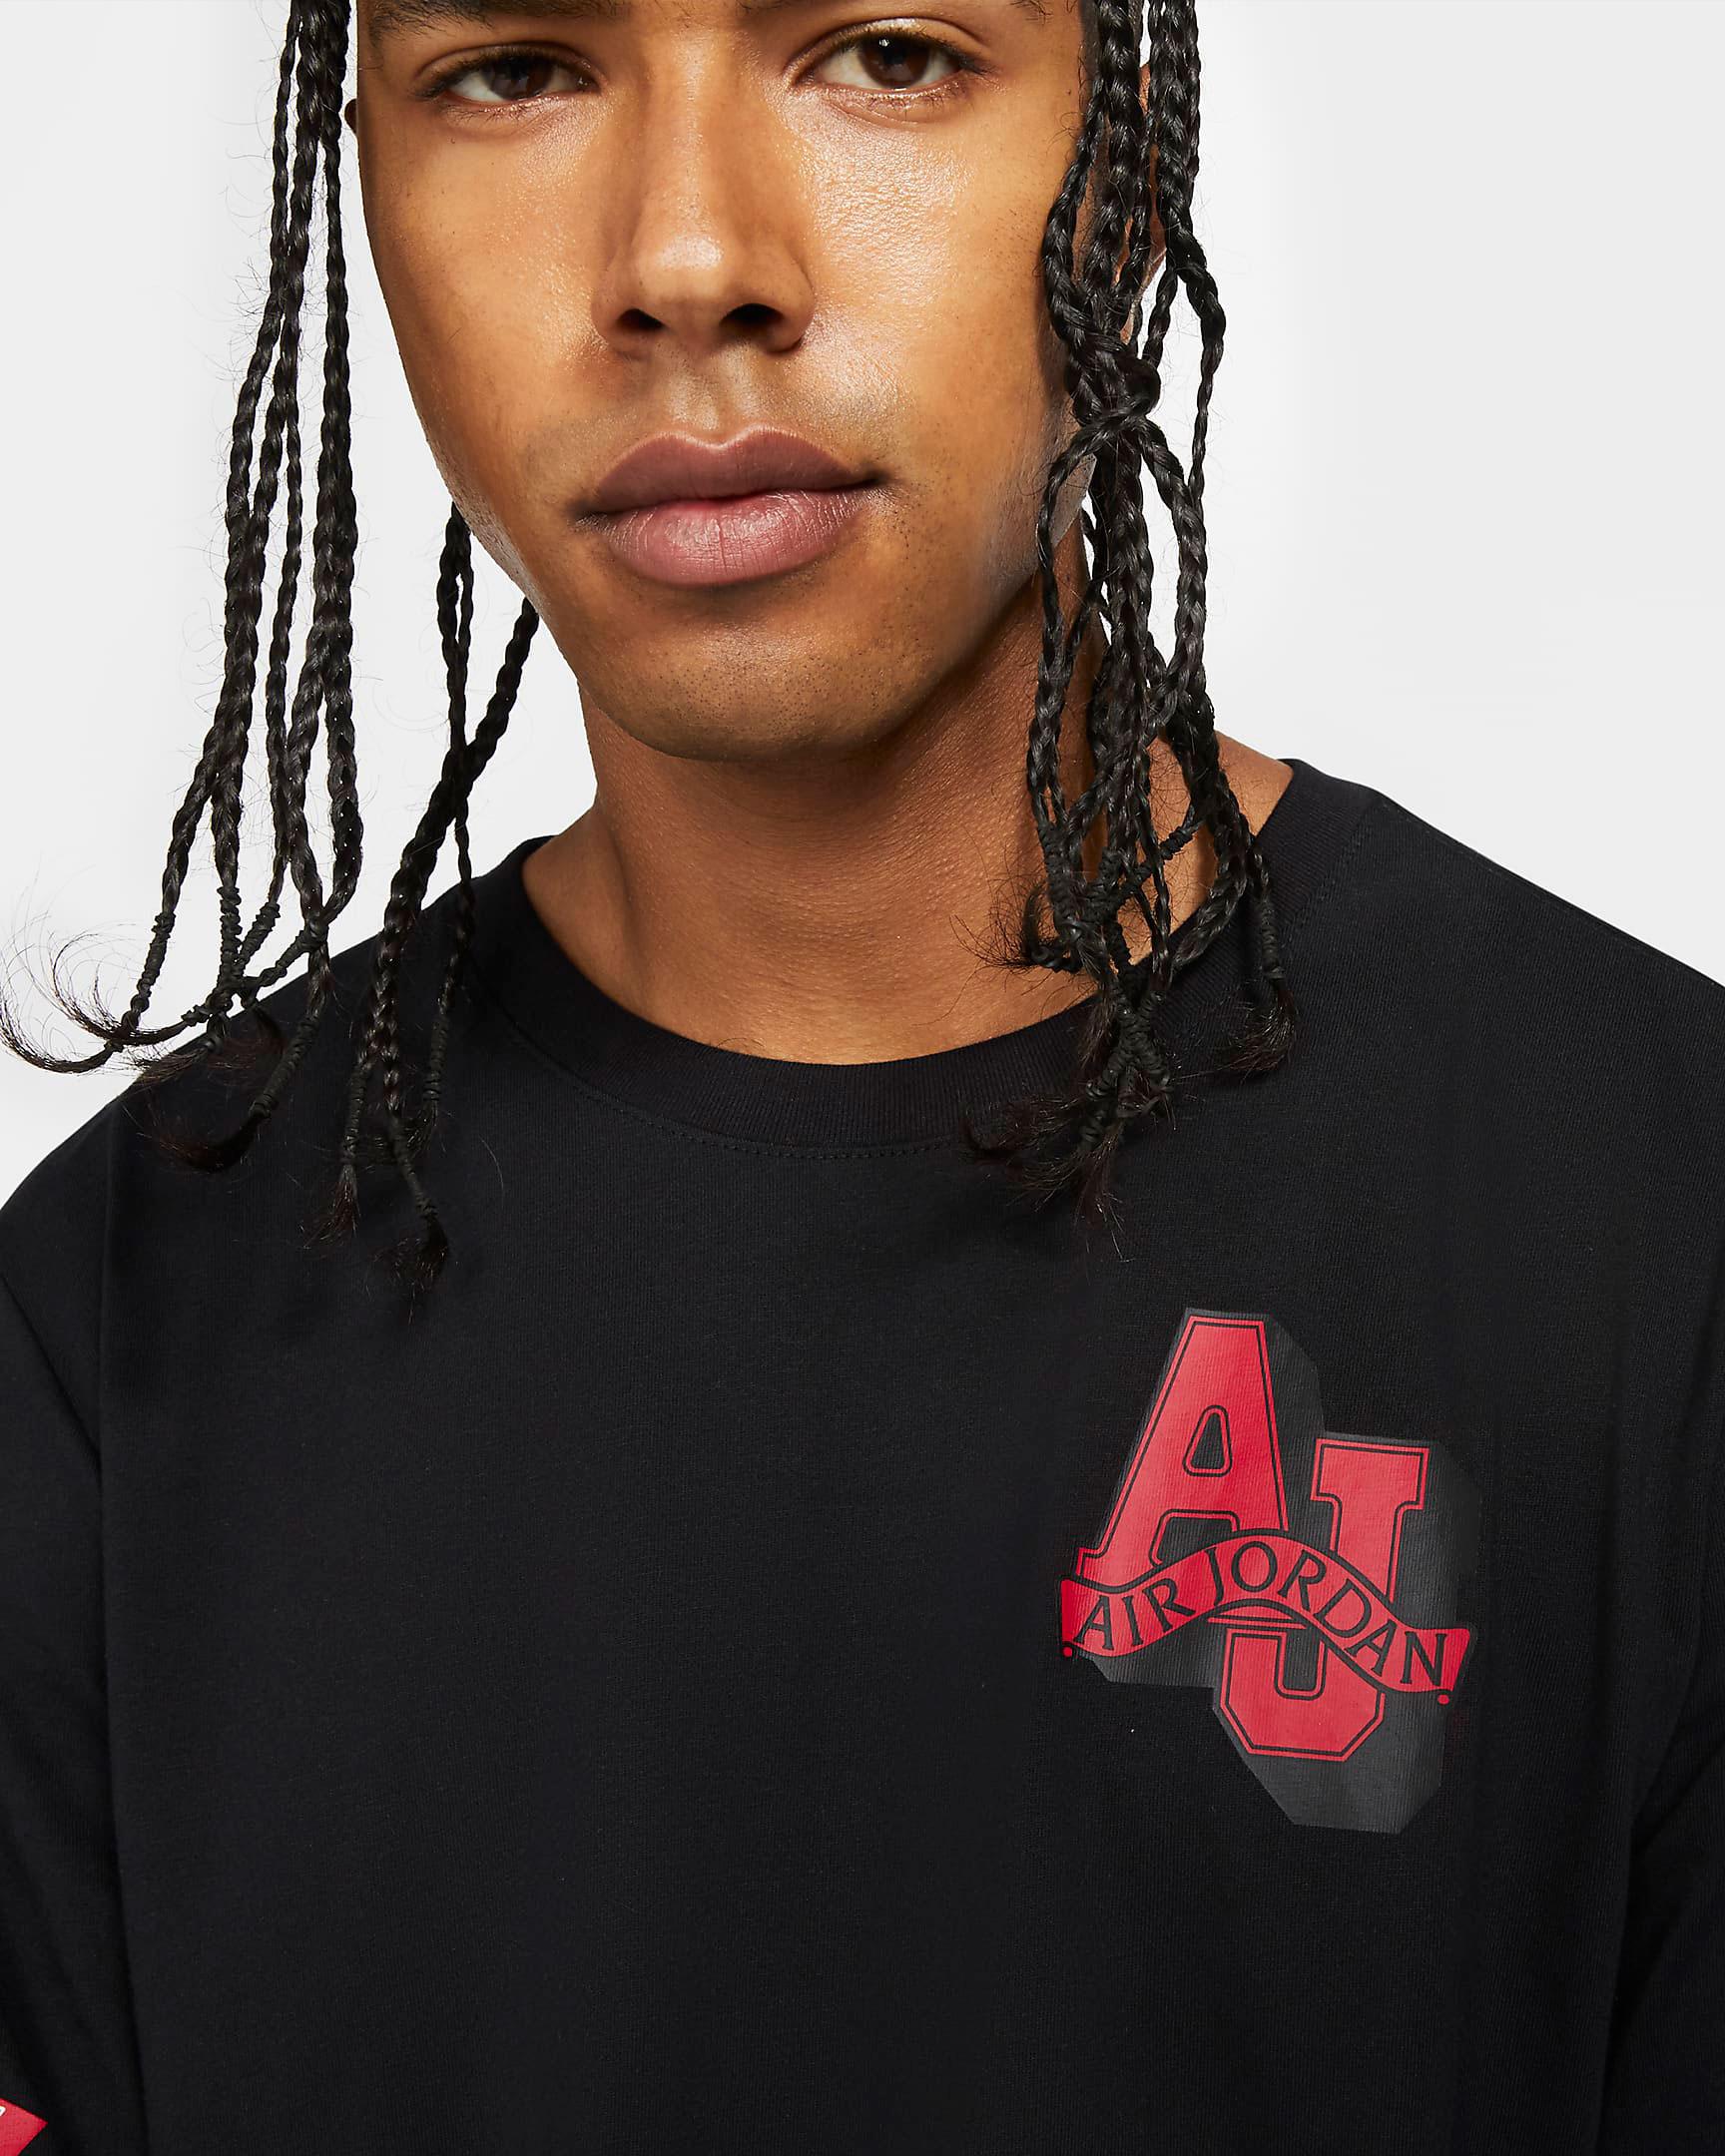 jordan-varsity-long-sleeve-shirt-black-2